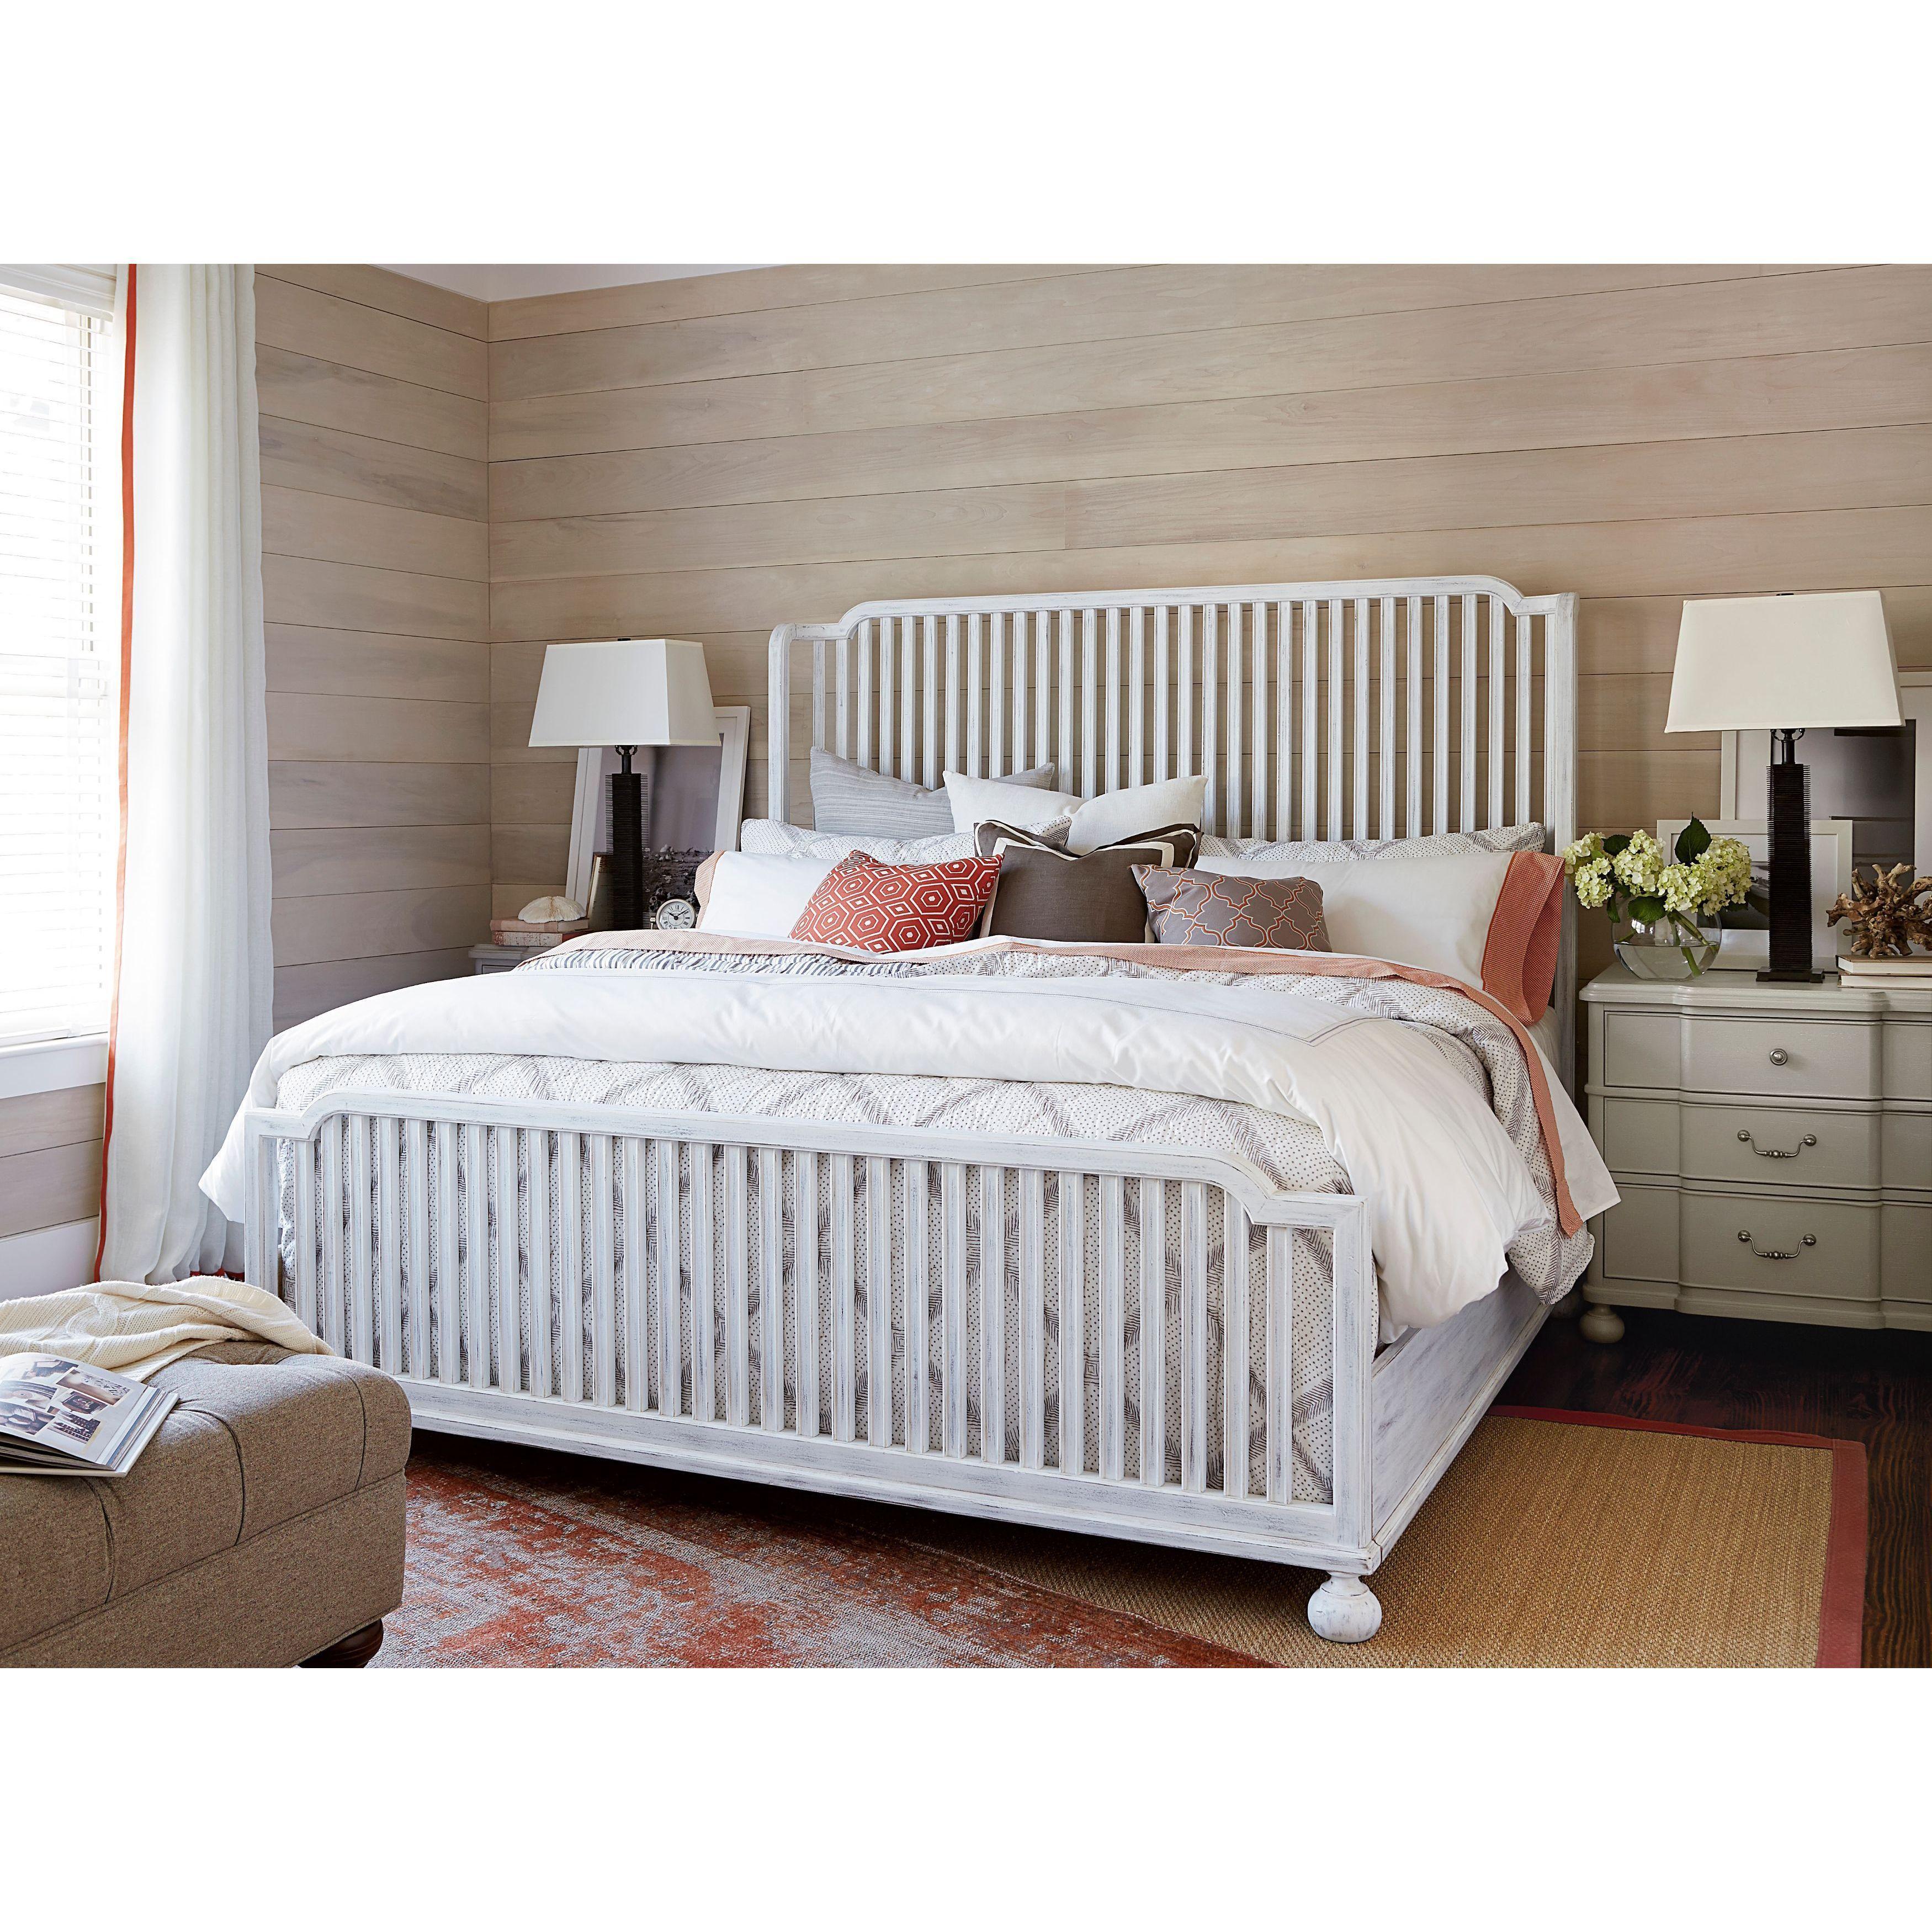 Paula deen tybee island complete bed products pinterest